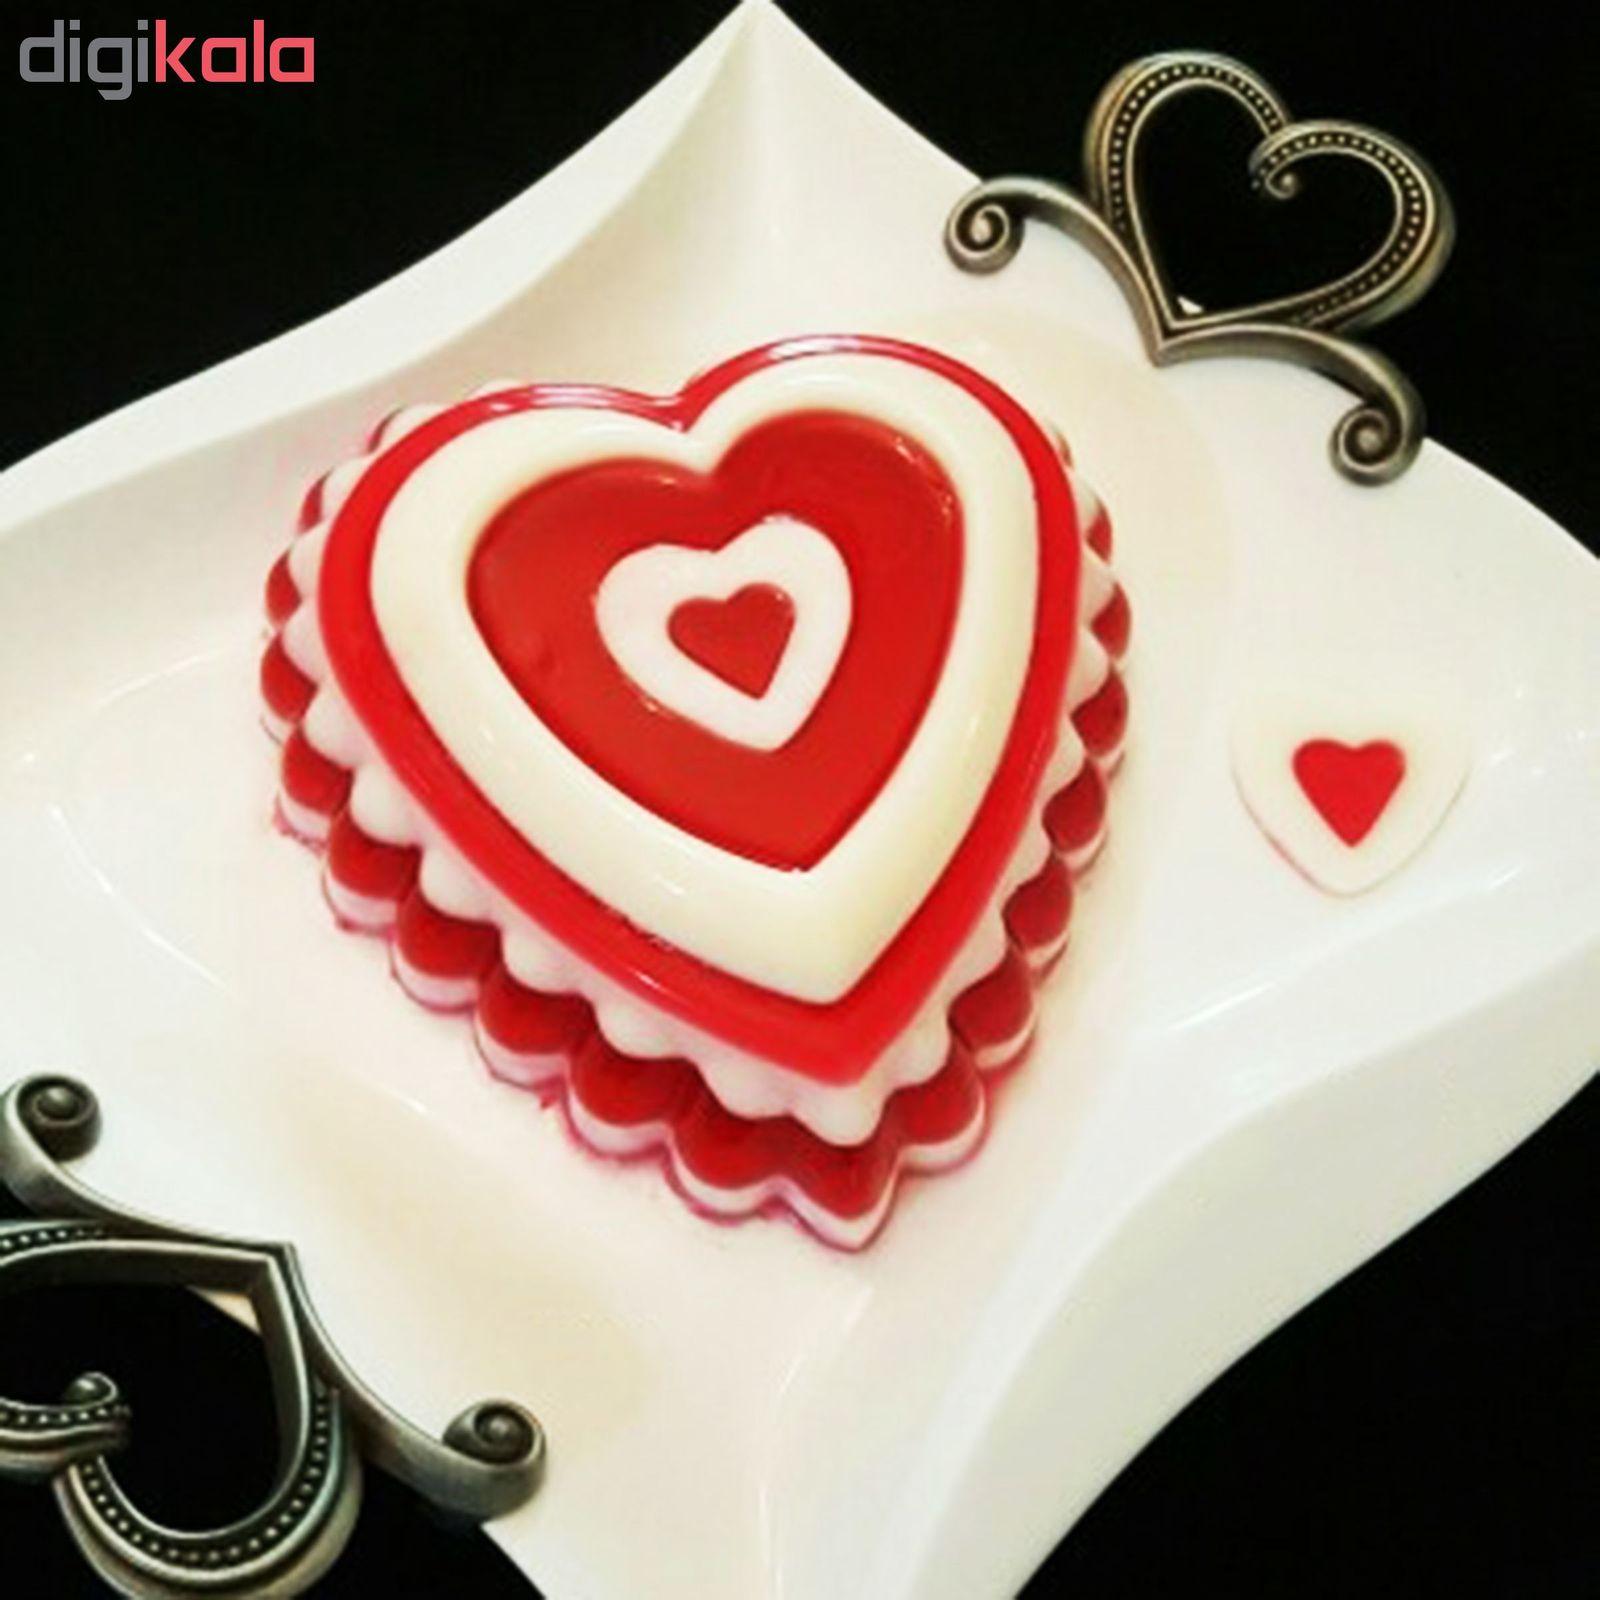 قالب ژله طرح قلب کد 001 main 1 9